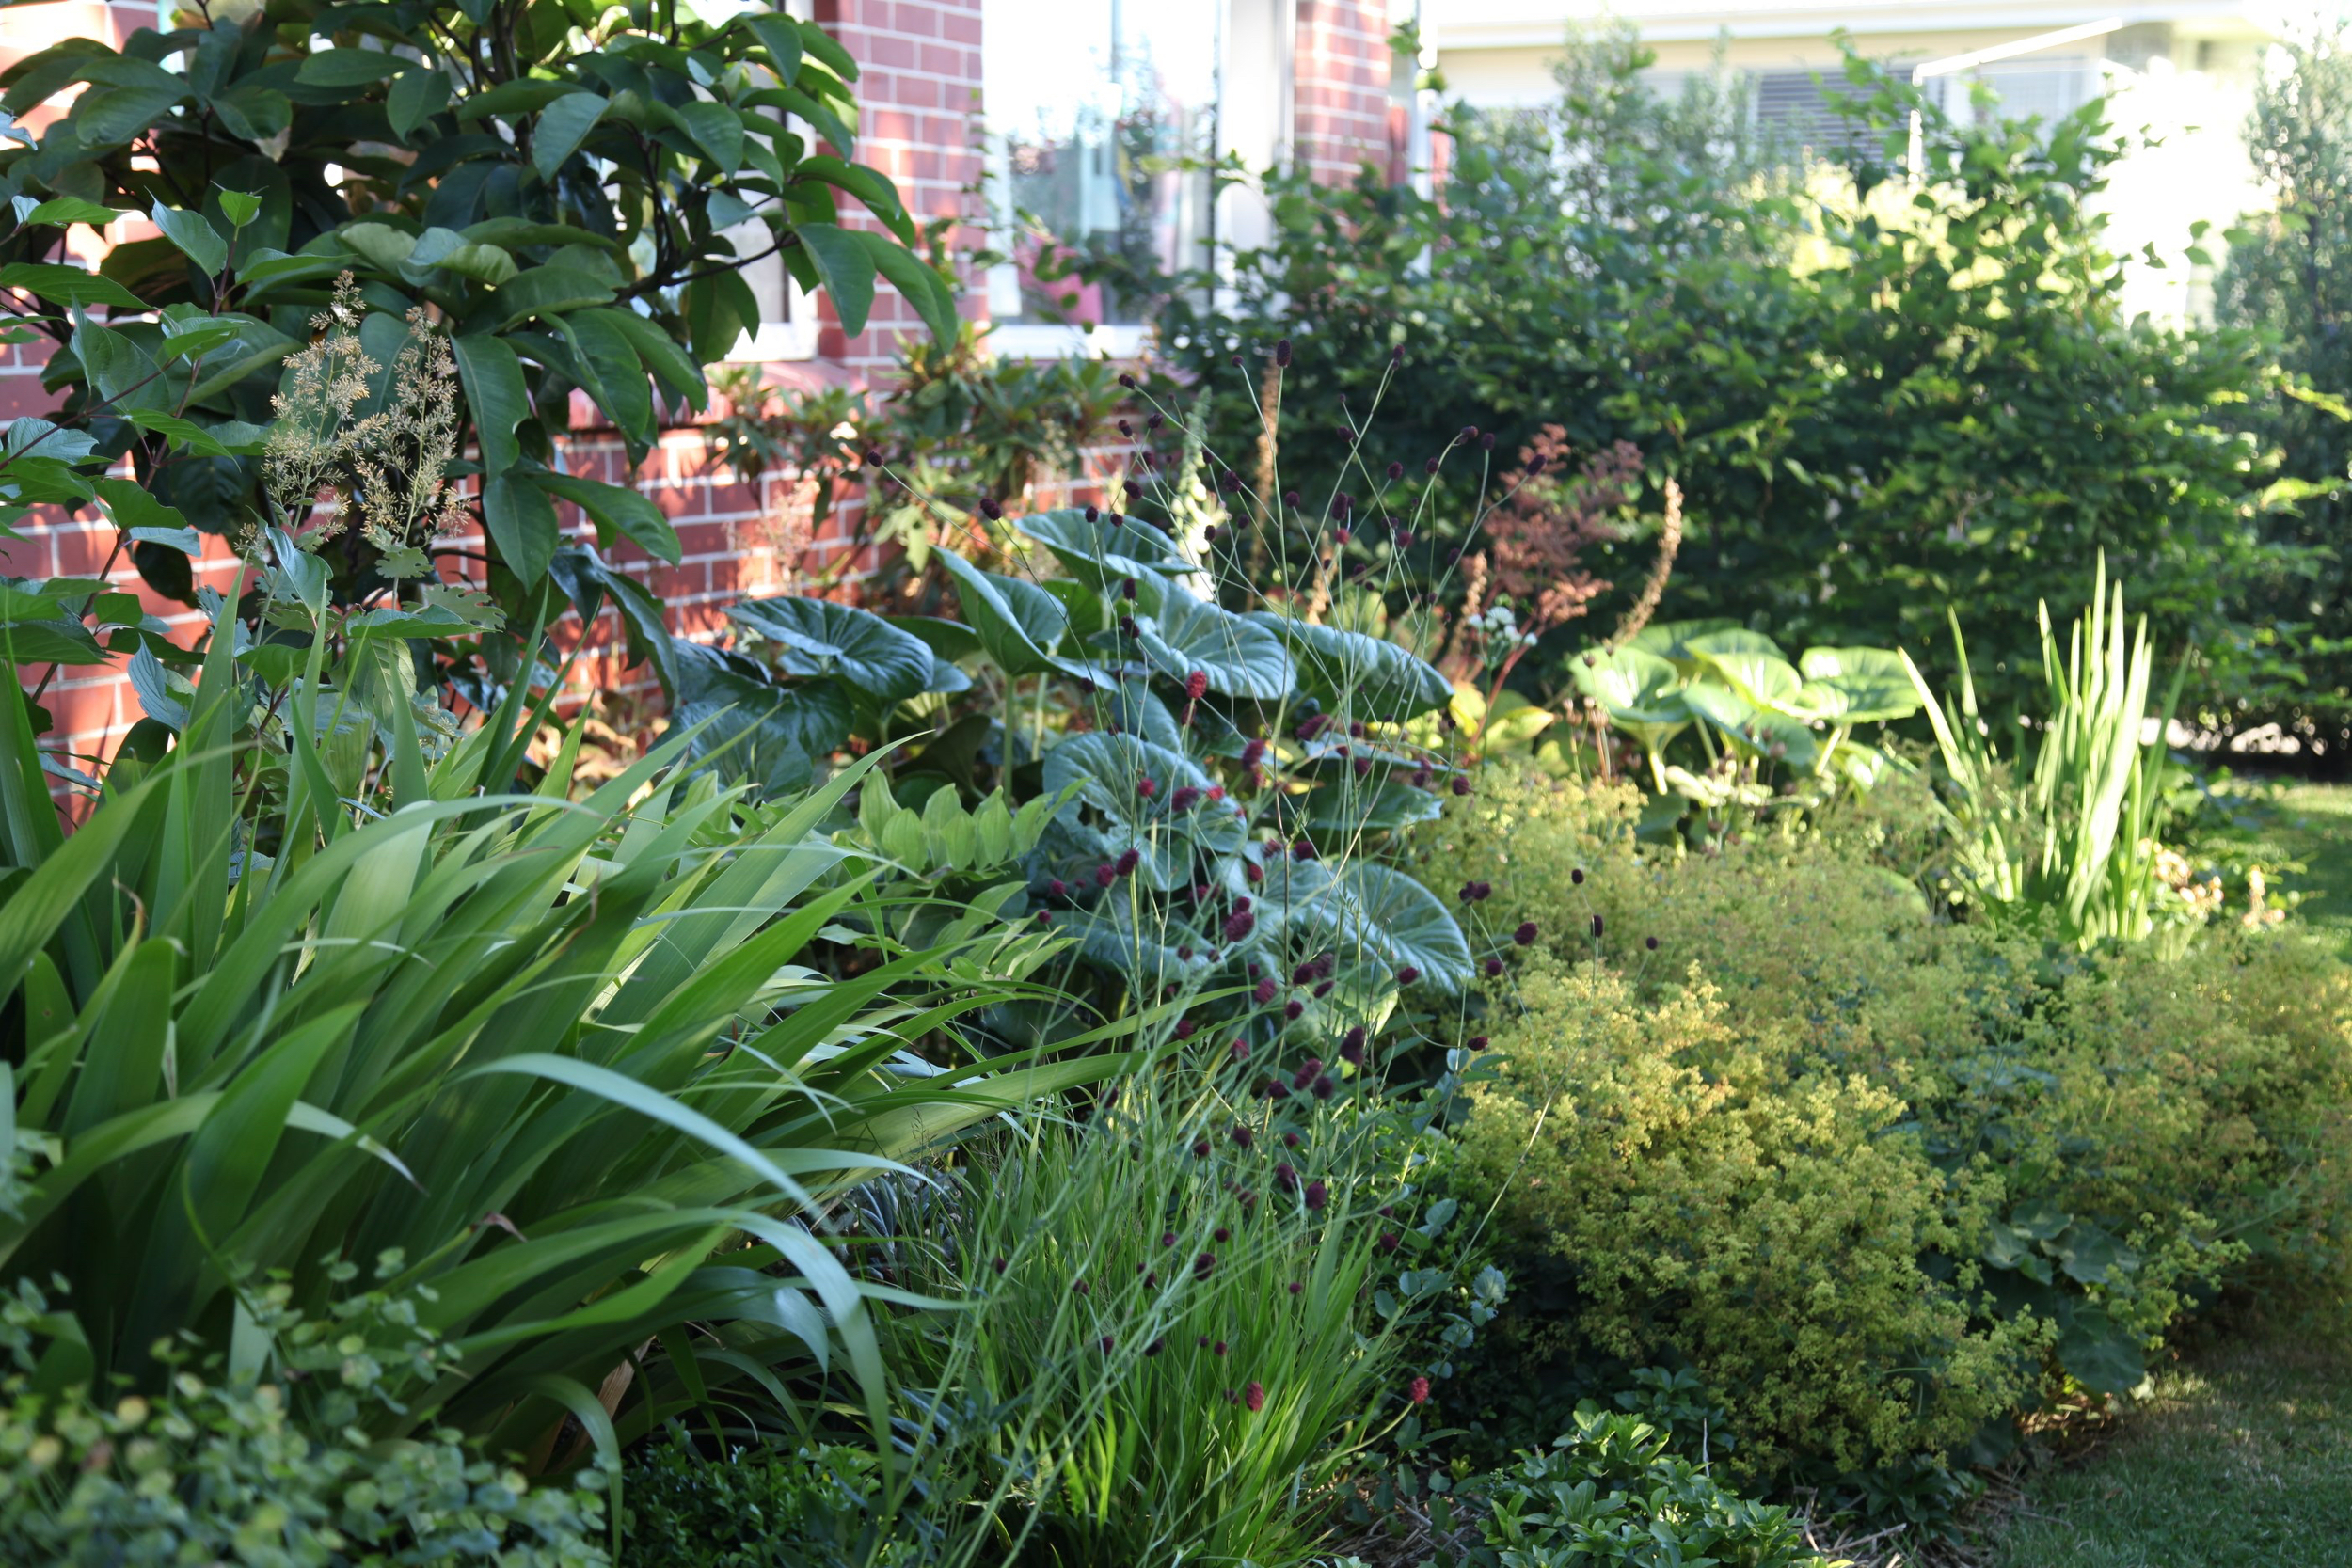 Paul's home garden